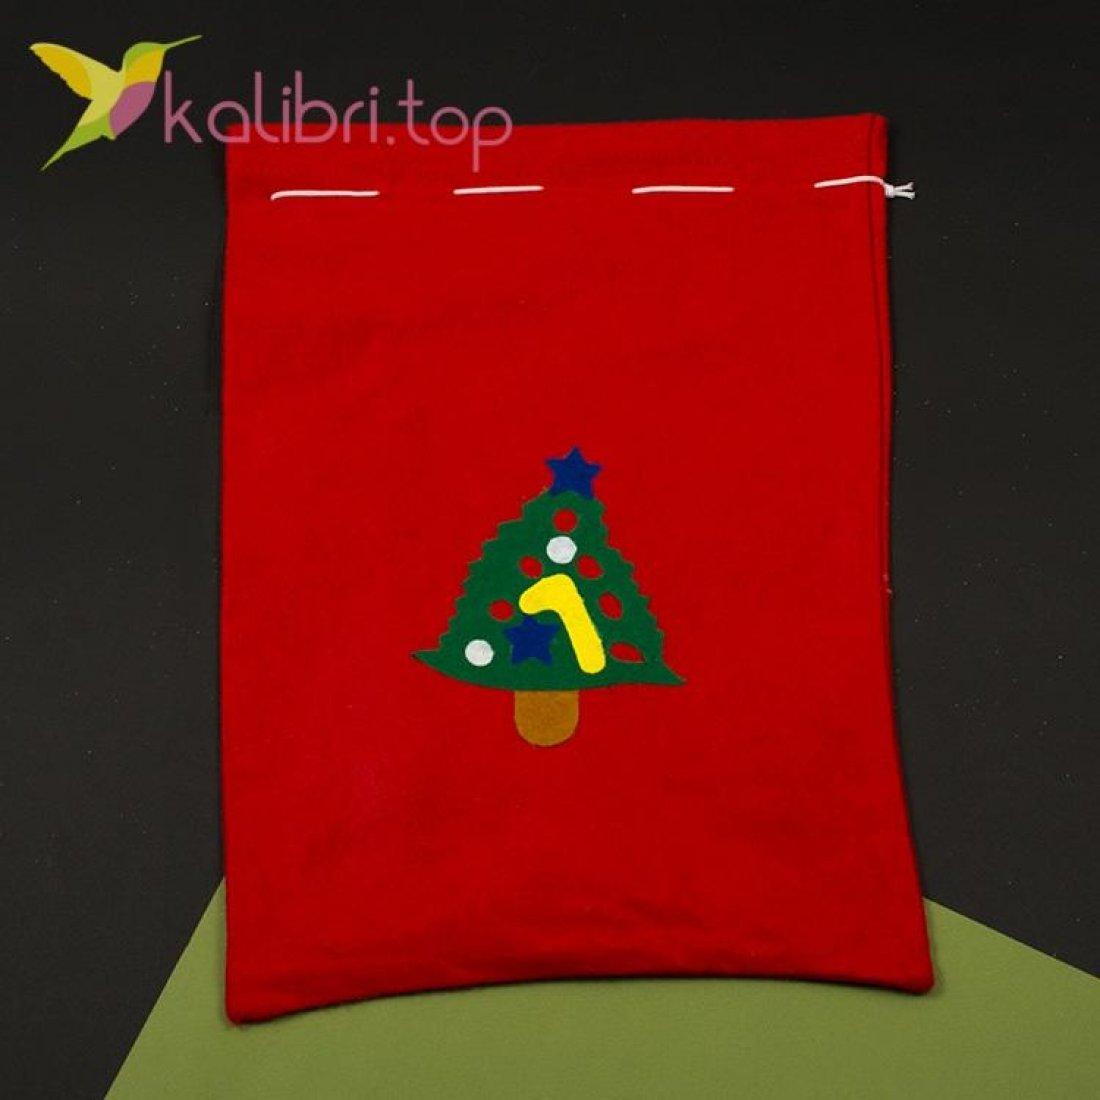 Мешок для подарков средний микс, оптом фото 4